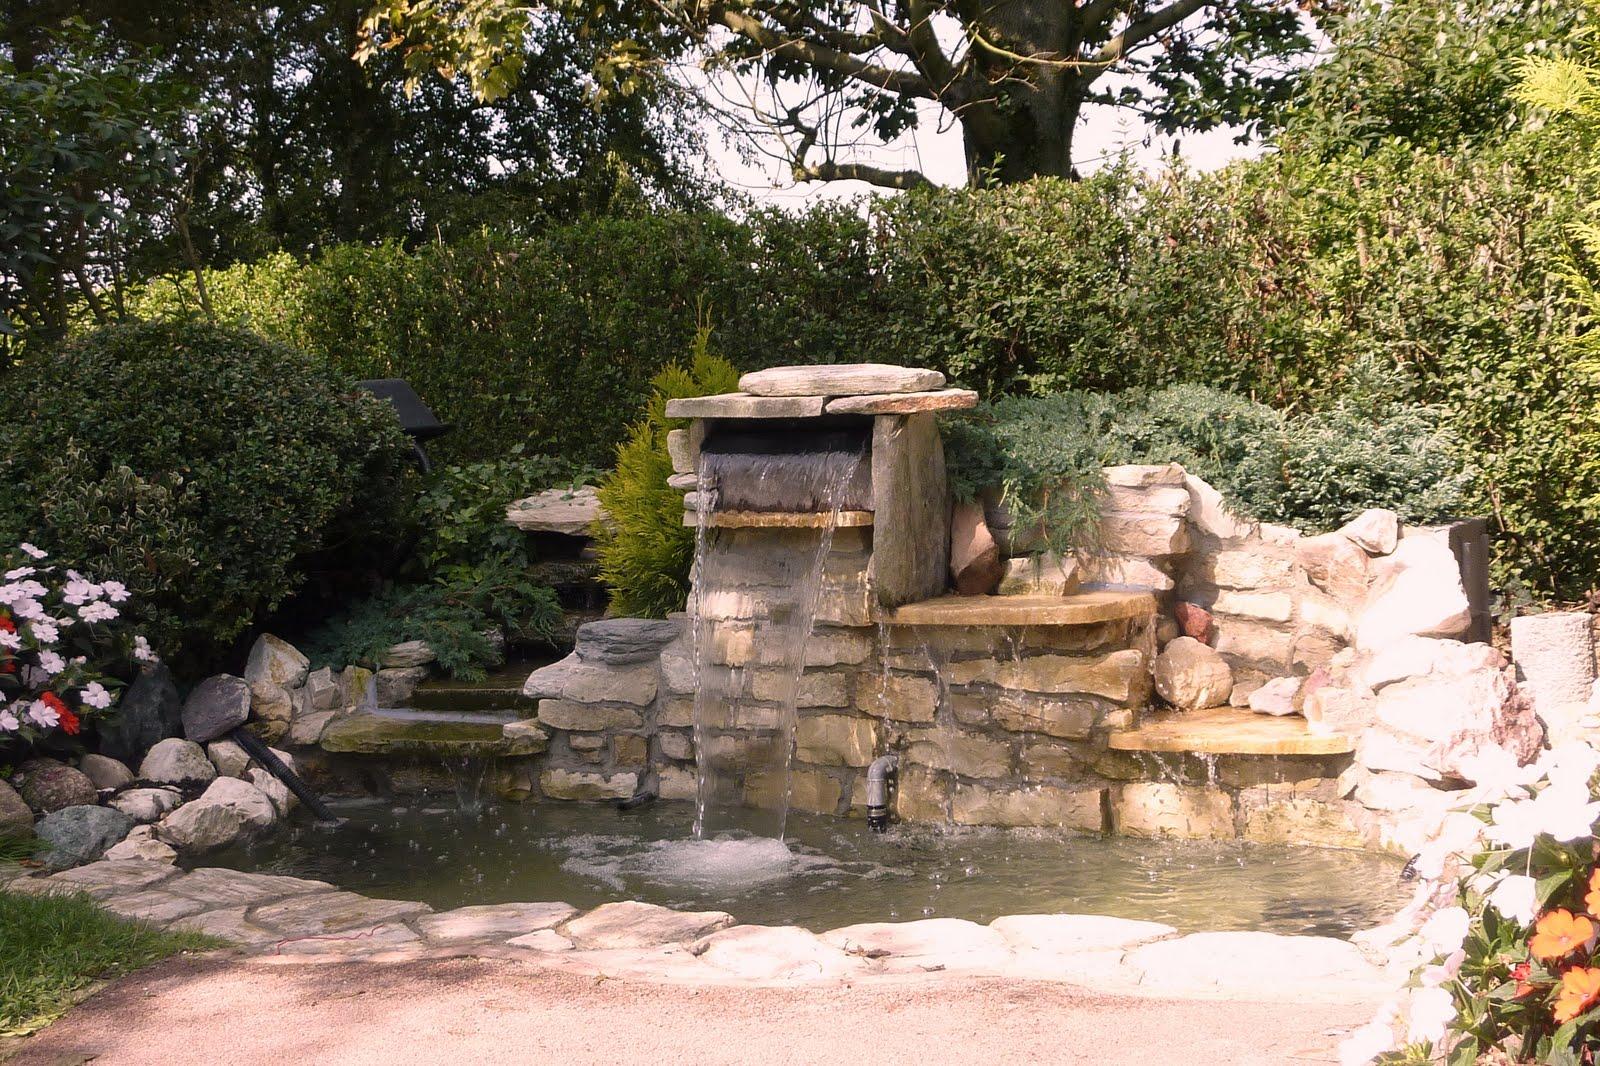 jardin de la sauvagine une belle cascade toute une petite faune s 39 y invite. Black Bedroom Furniture Sets. Home Design Ideas